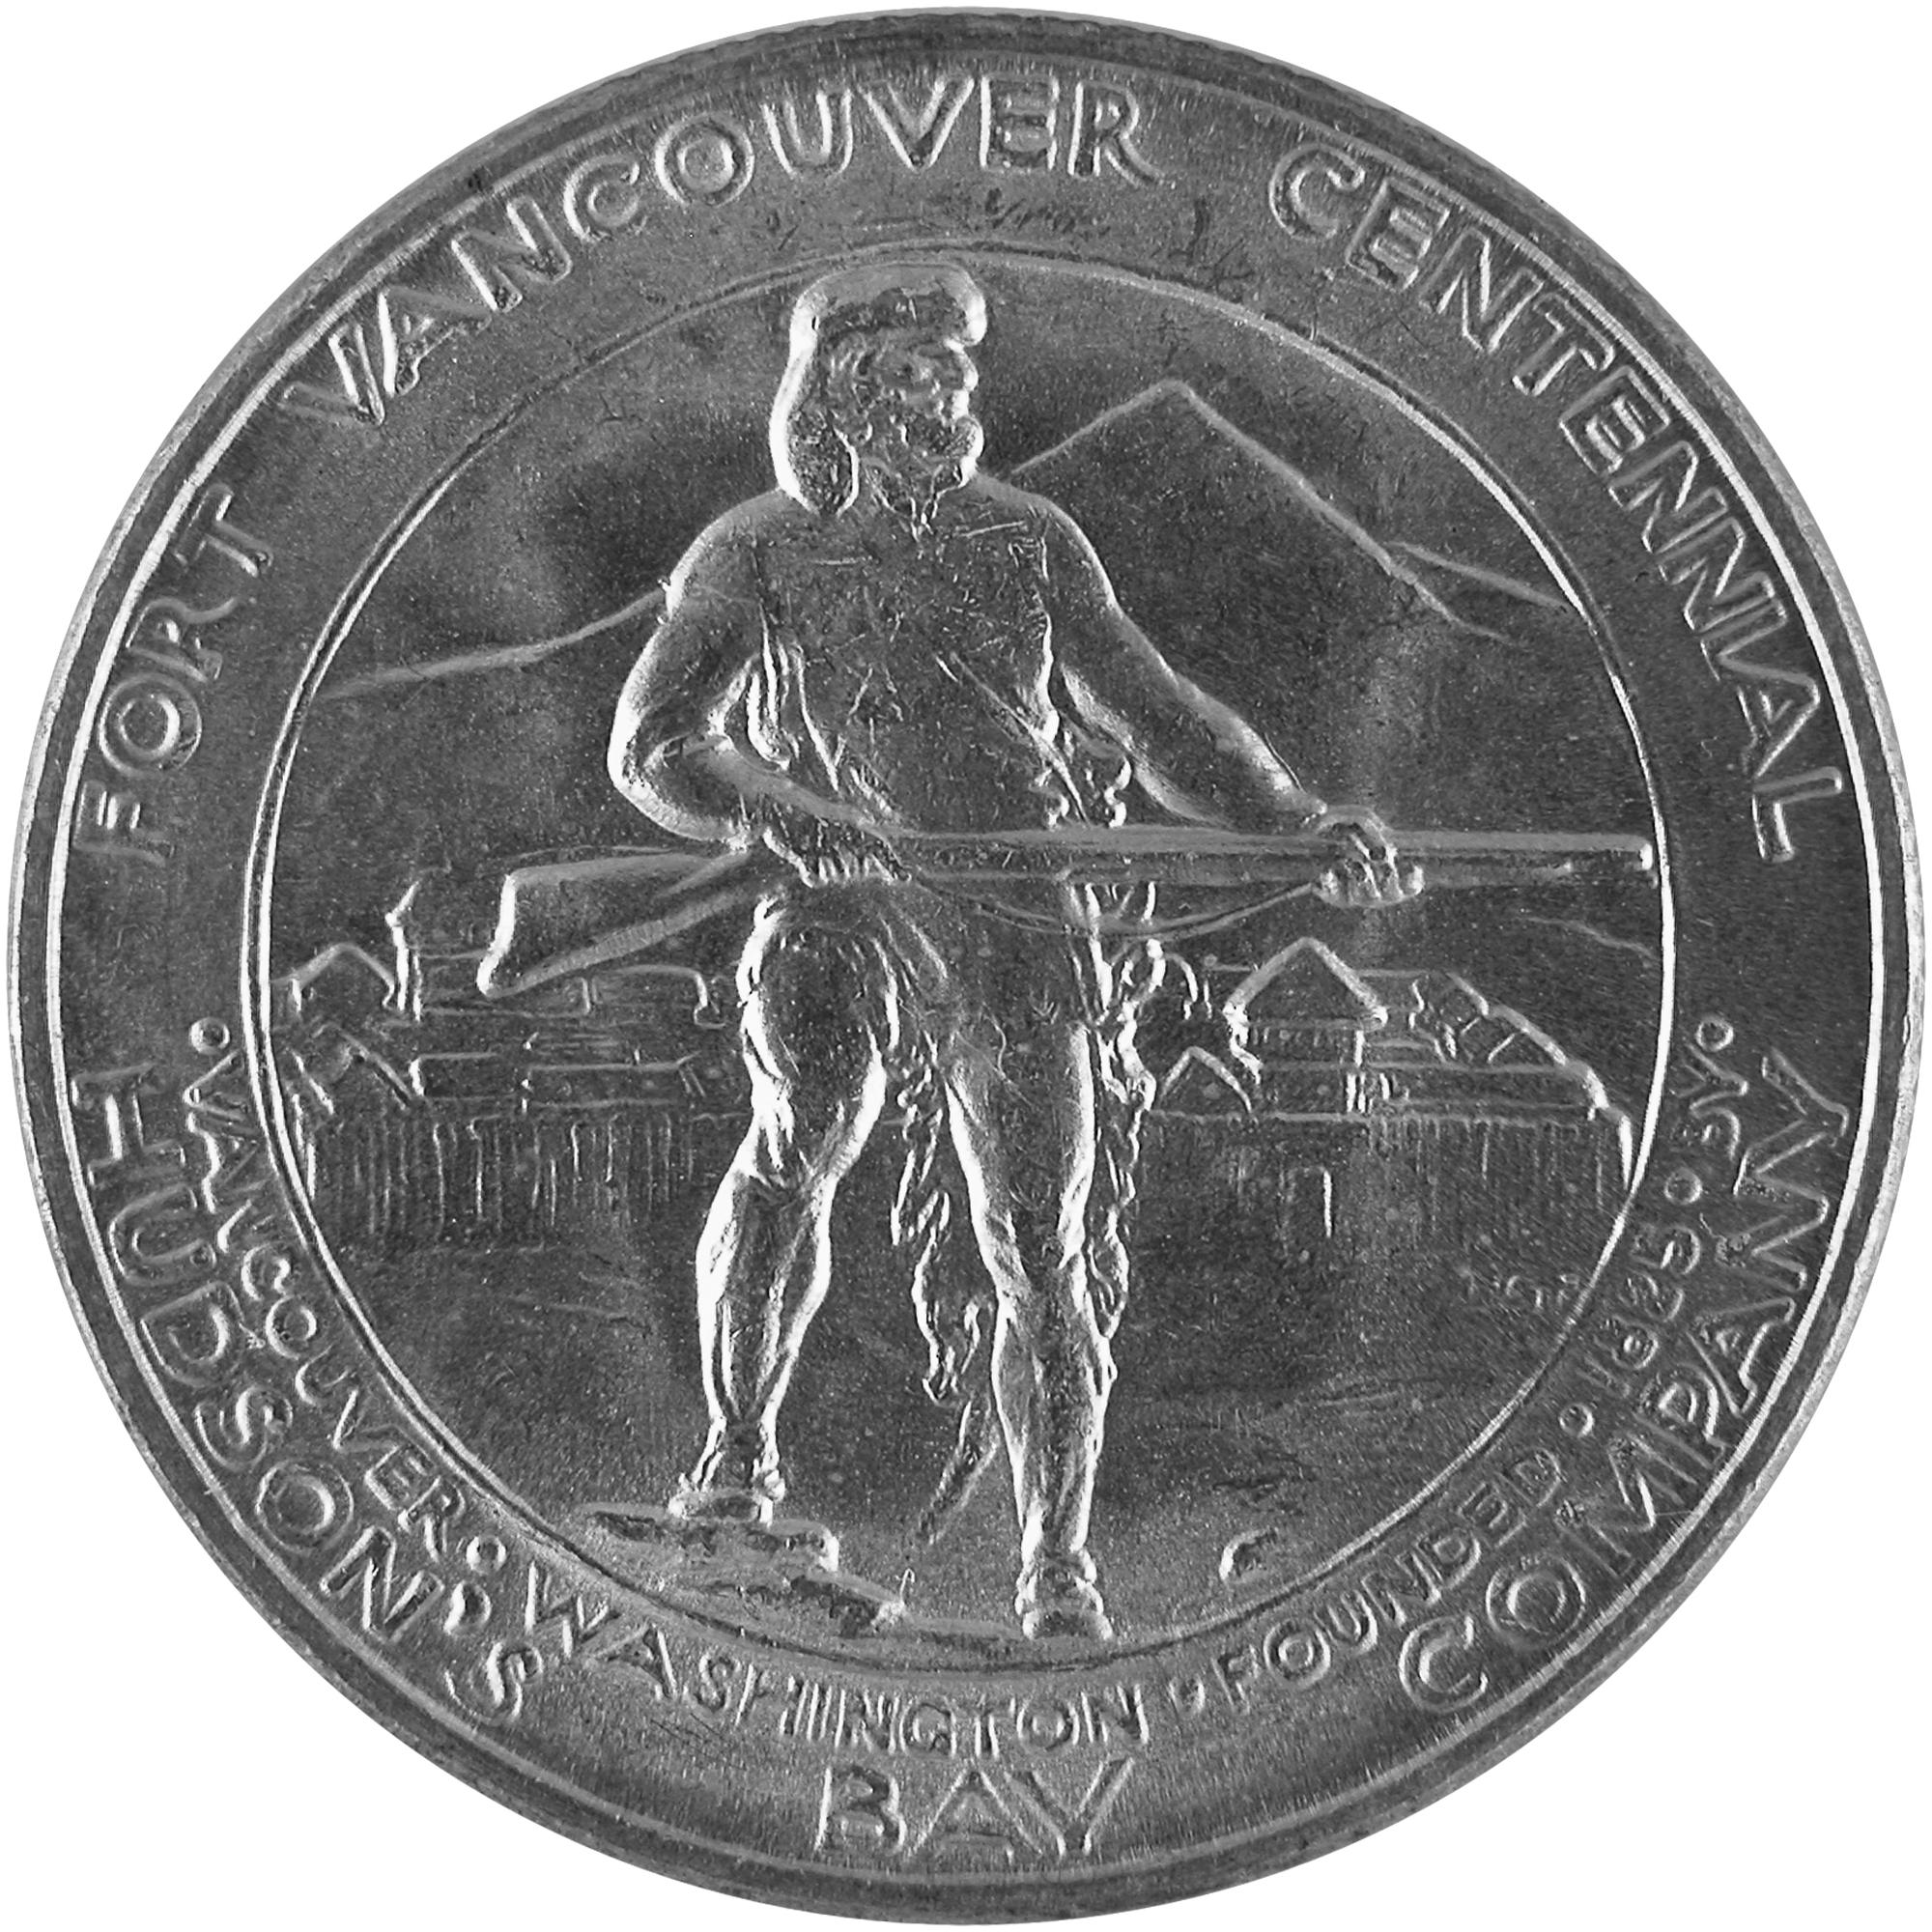 1925 Fort Vancouver Centennial Commemorative Silver Half Dollar Coin Reverse